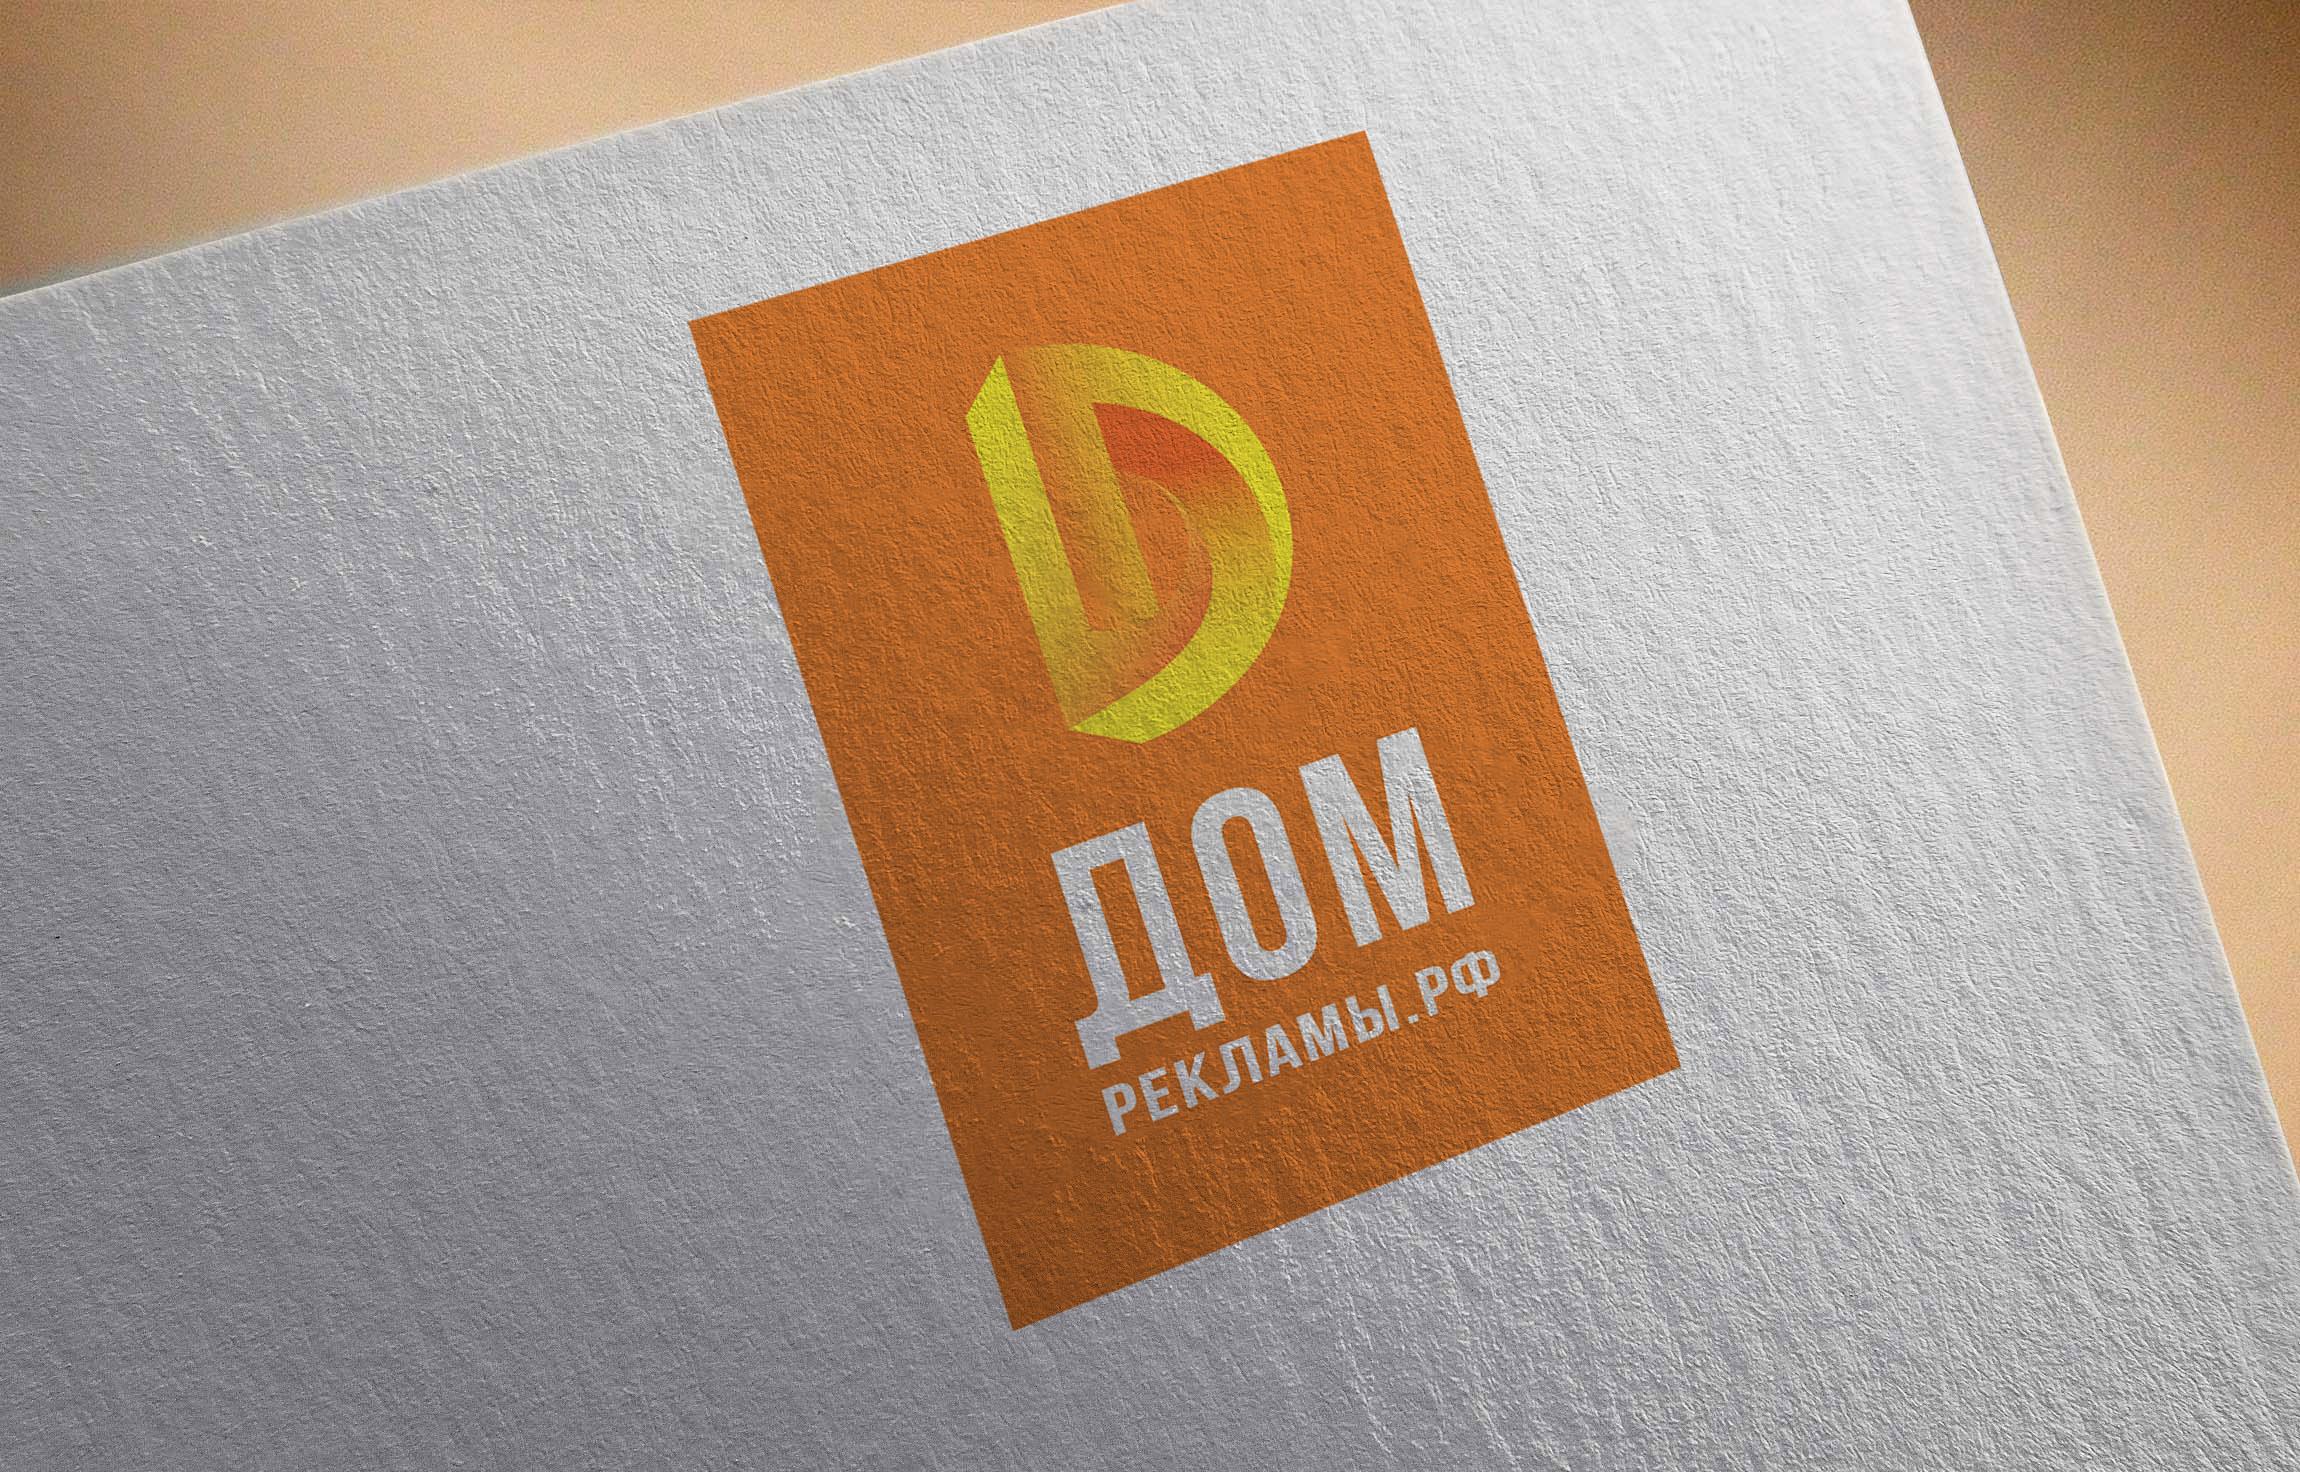 Дизайн логотипа рекламно-производственной компании фото f_3505edcf3bfaea03.jpg